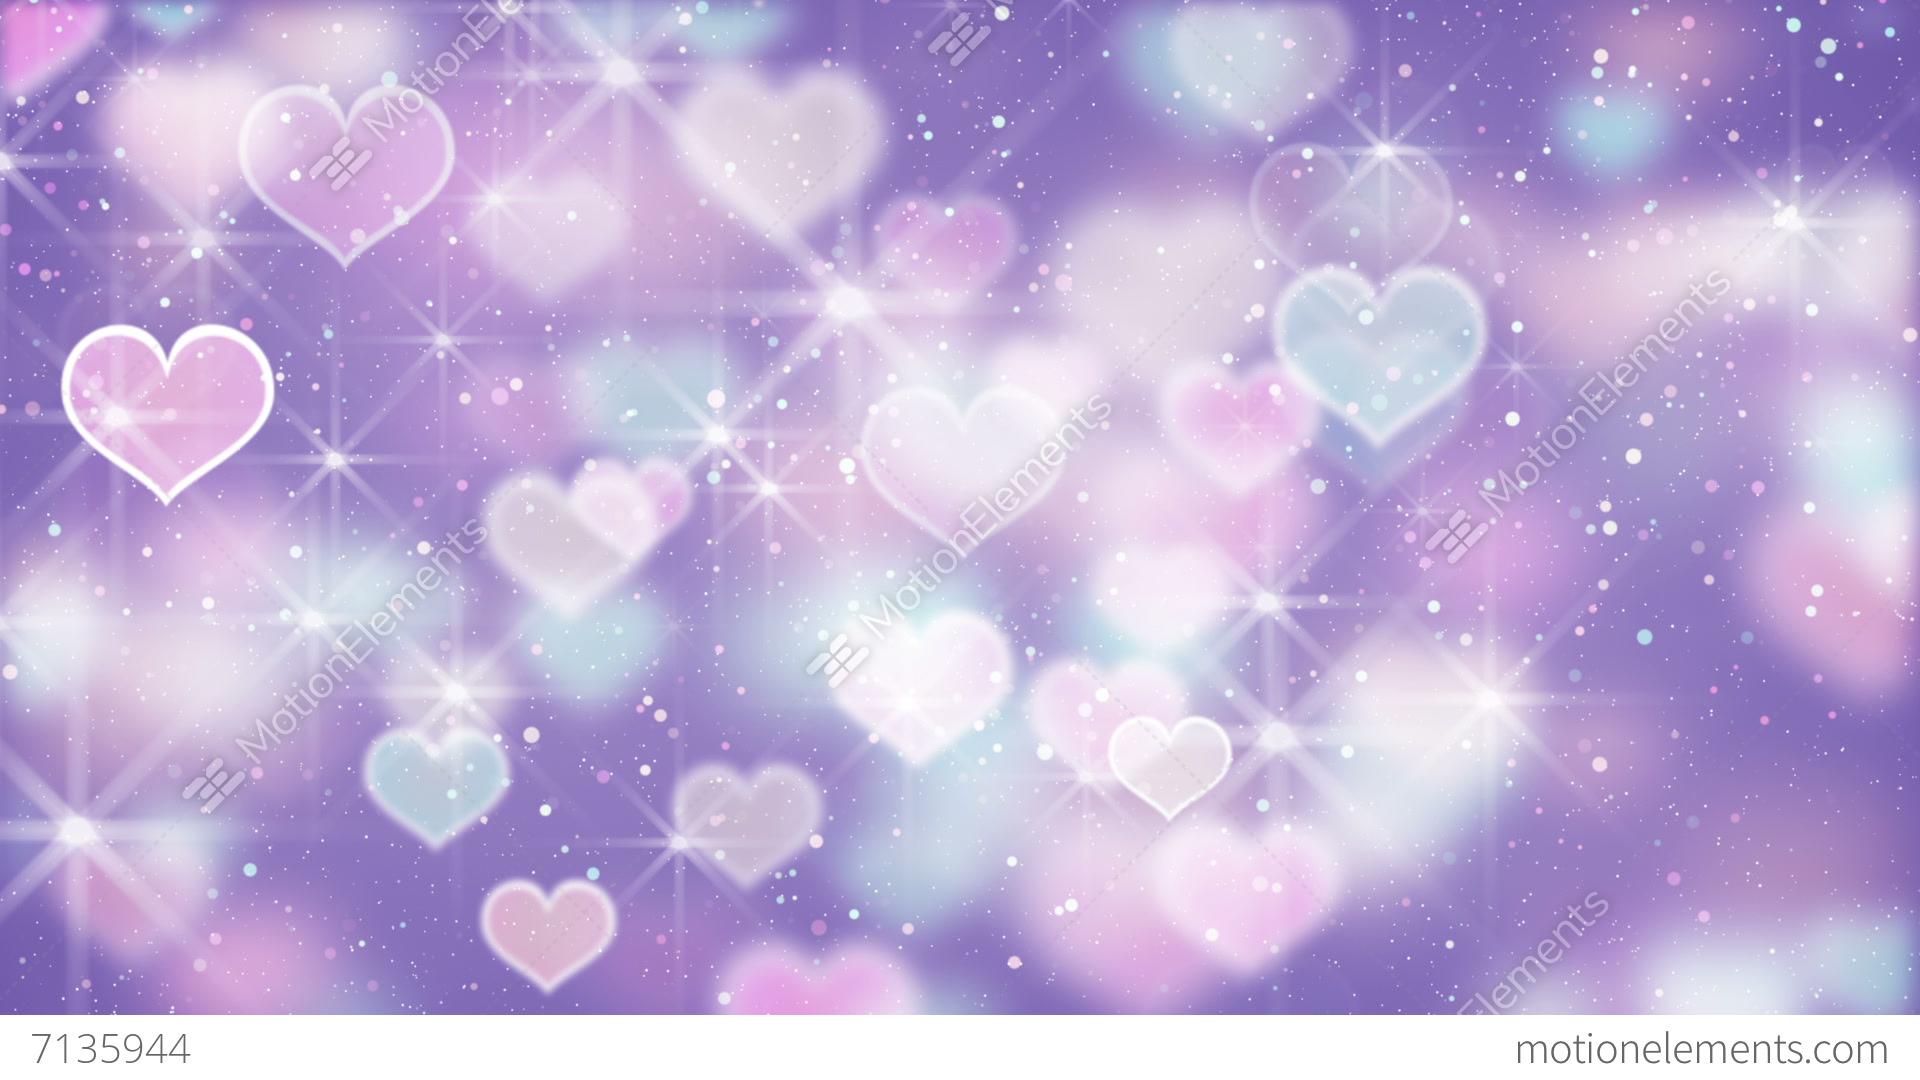 Bokeh Heart Shape Of Light Background Stock Footage Video: Elegant Color Hearts Bokeh Lights Loopable Background